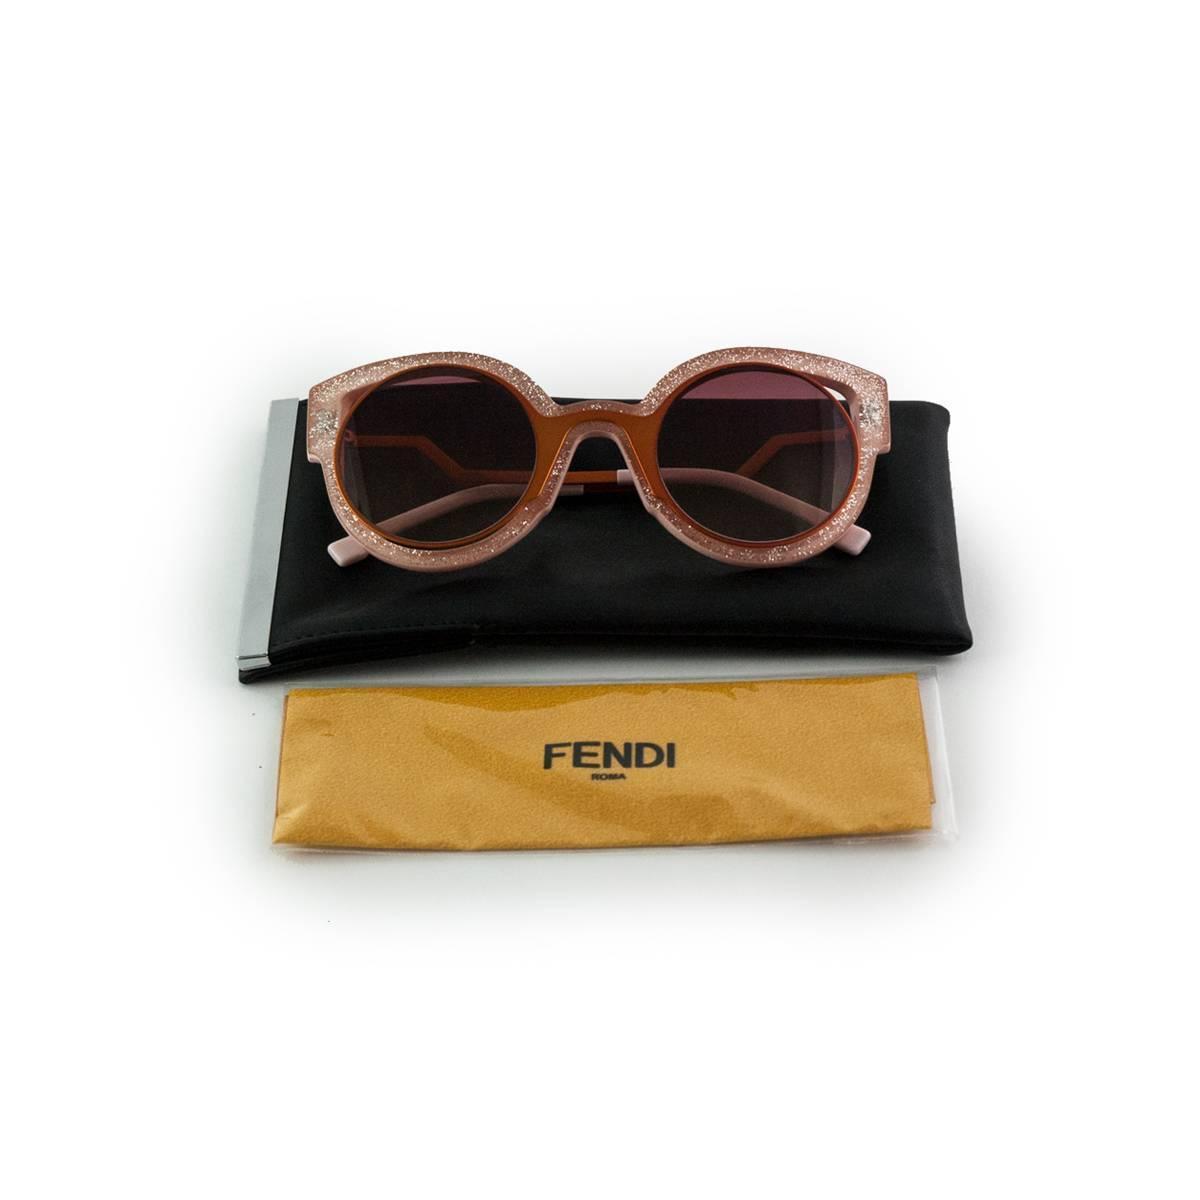 5d6d95efe2b2 Fendi Paradeyes Pink sunglasses at 1stdibs